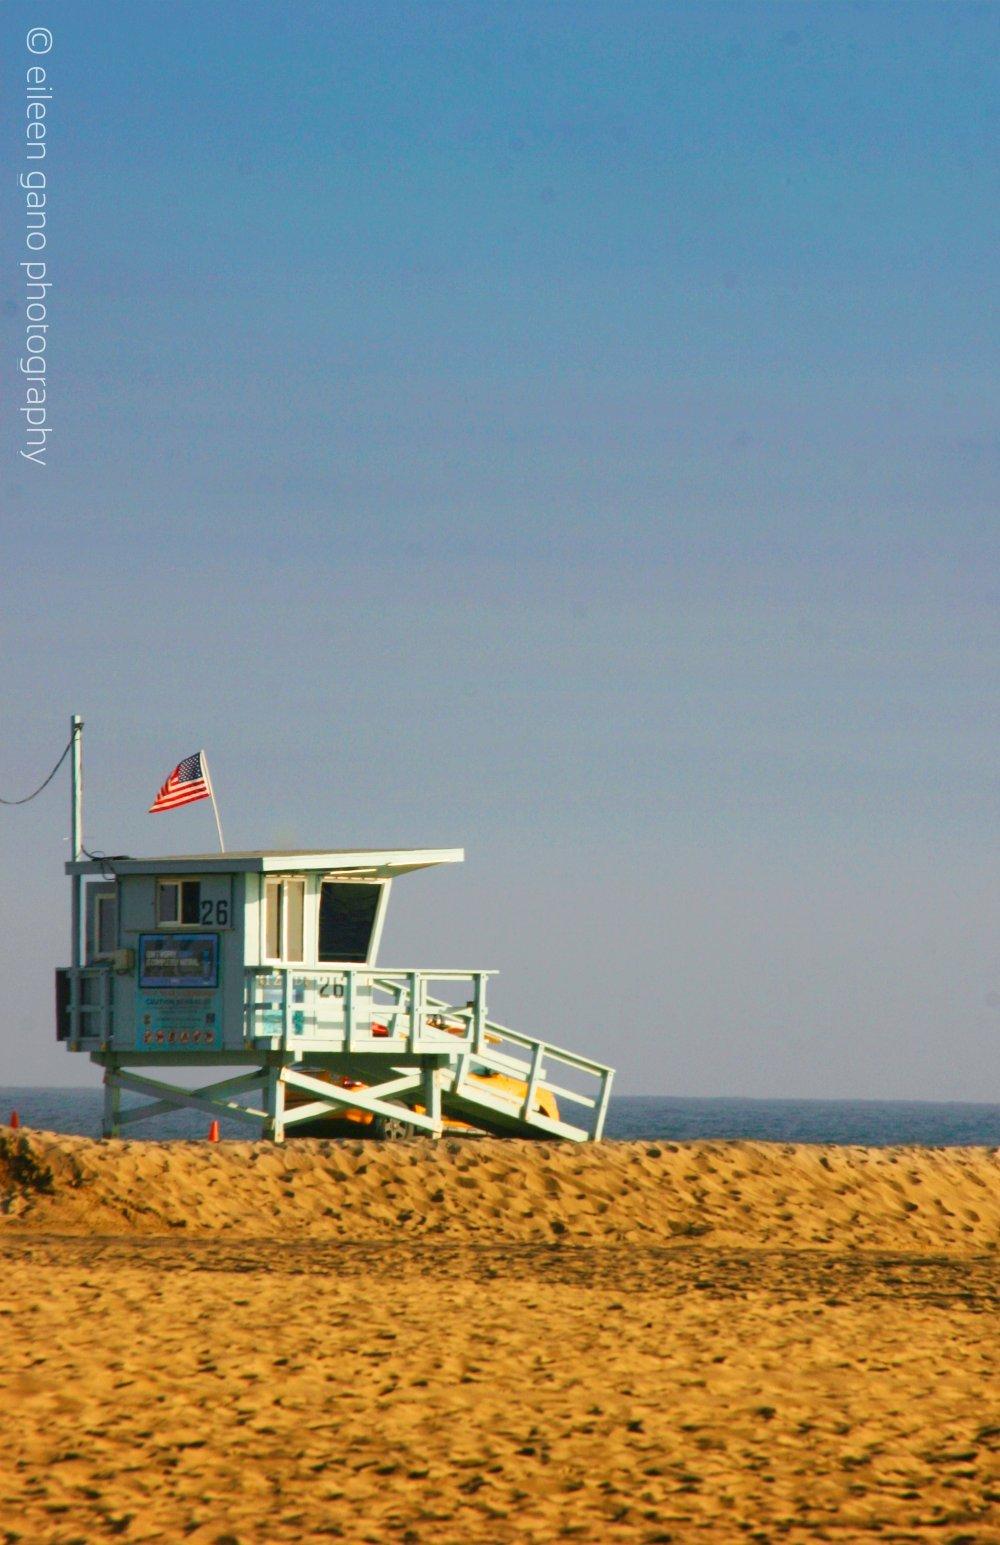 1-landscape-1-santa-monica-beach-lifegaurd-stand-eileen-gano